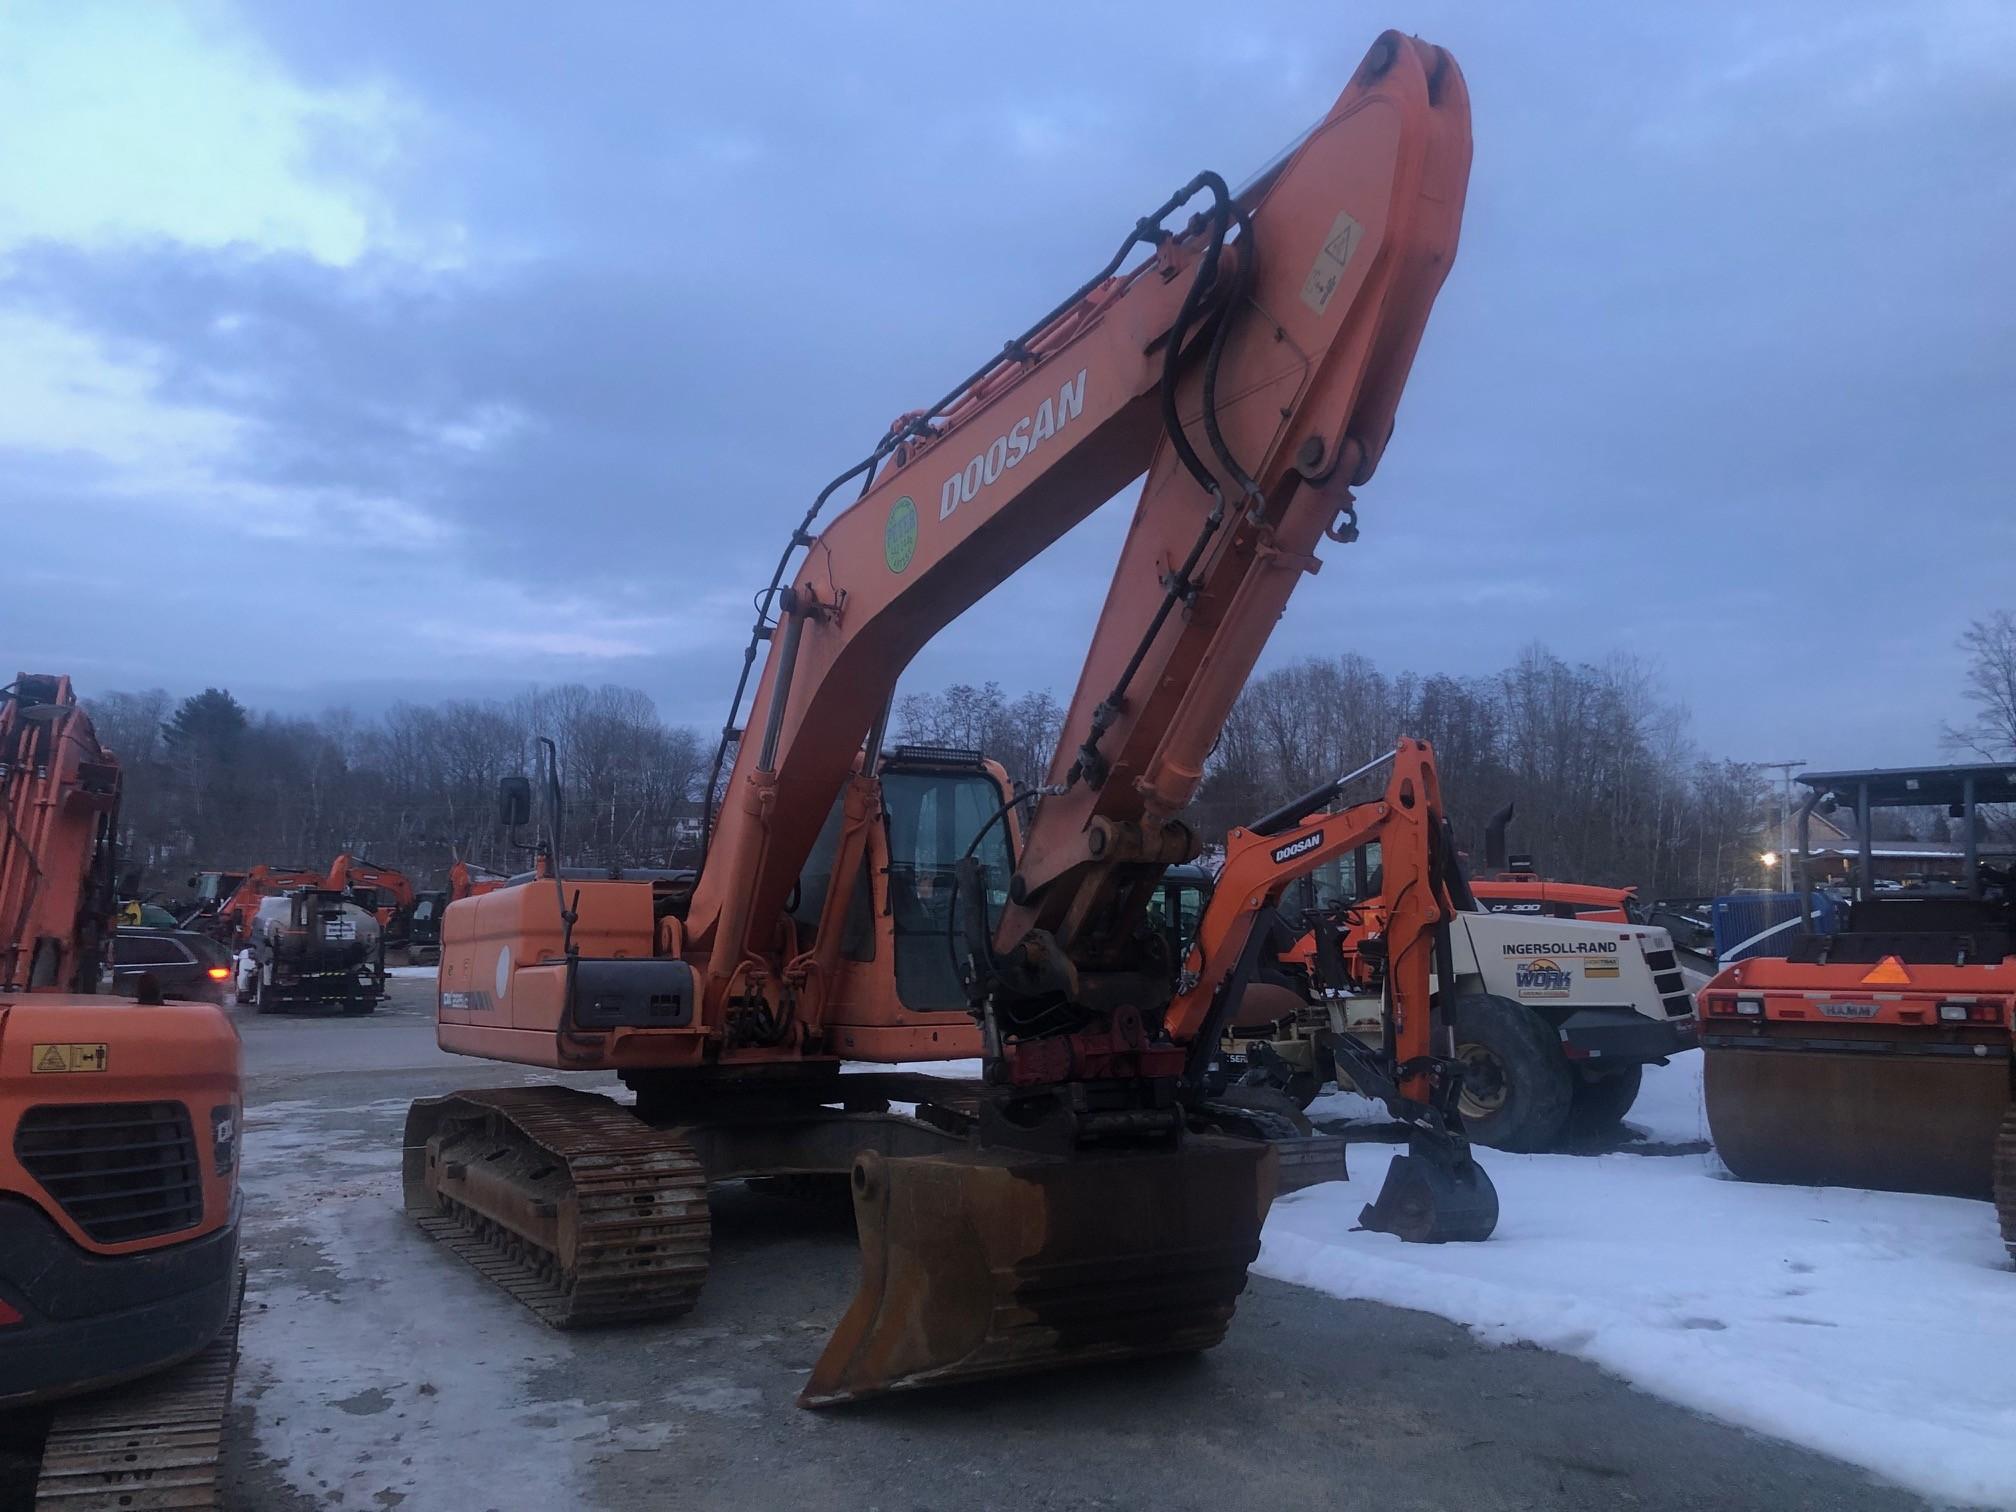 Used, 2007, Doosan Construction, DX225LC, Excavators